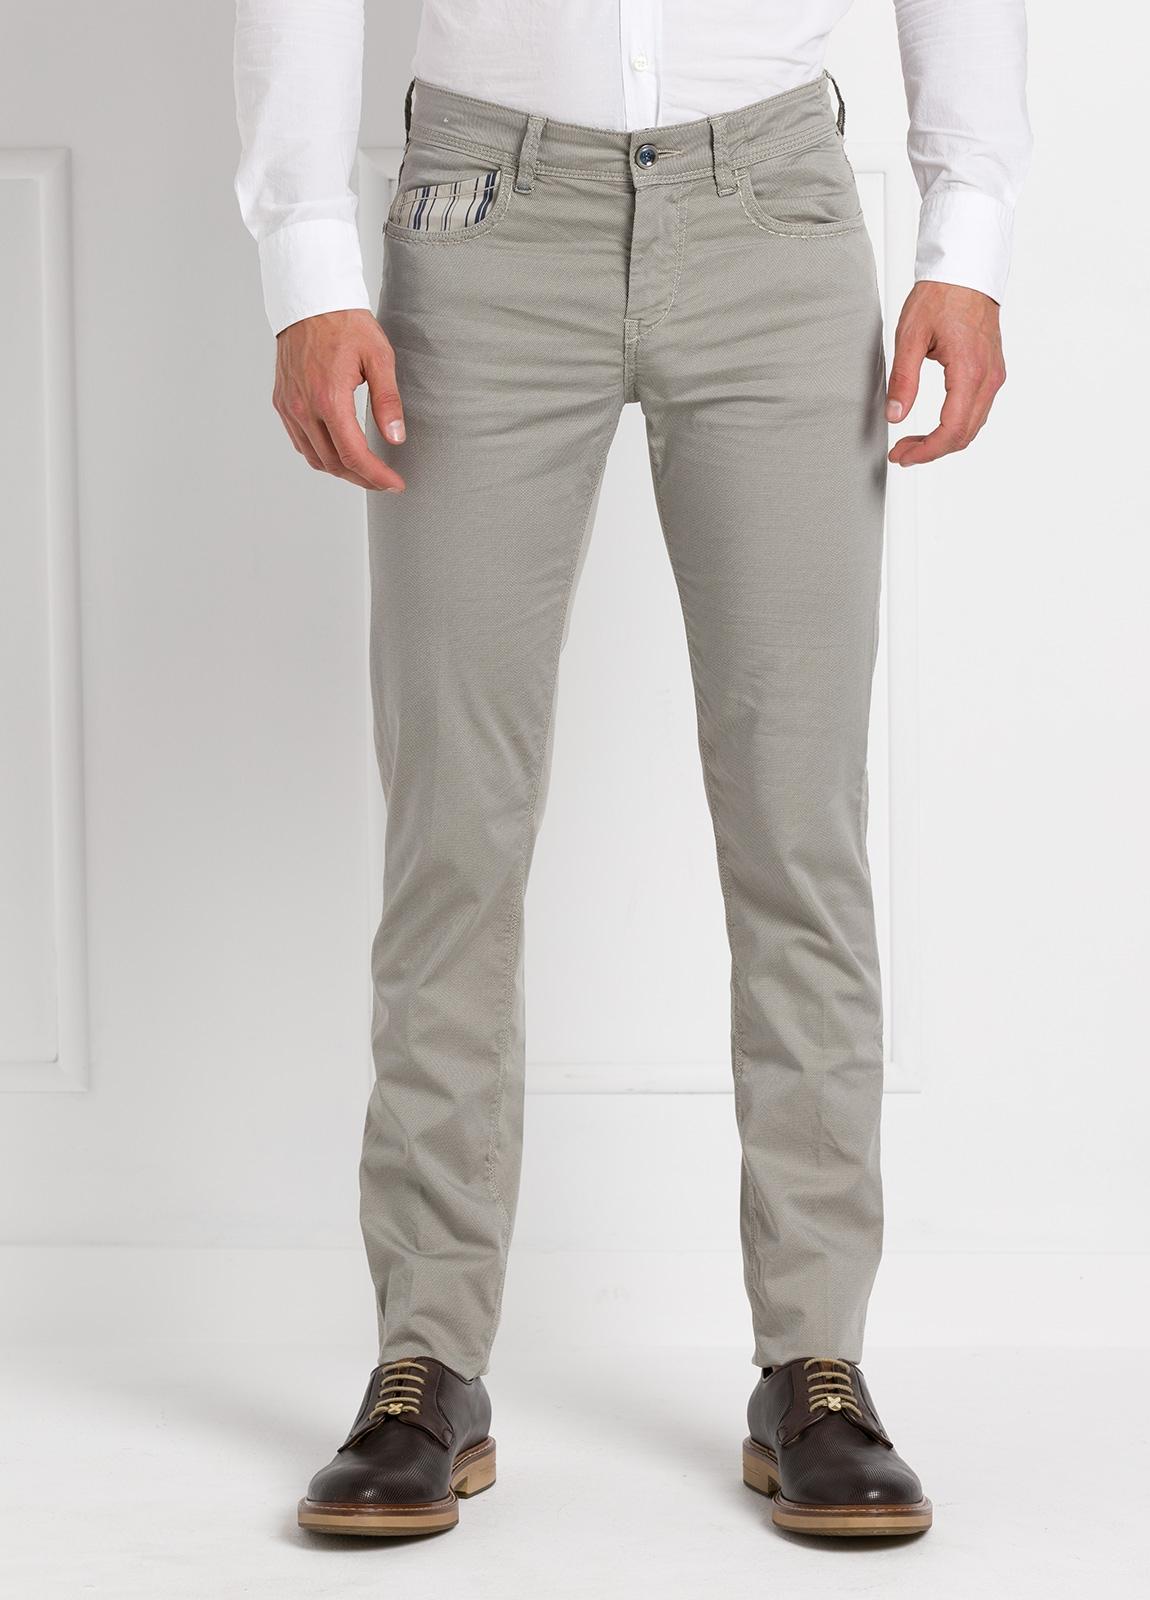 Pantalón sport slim fit modelo RUBENS Z color piedra. Algodón